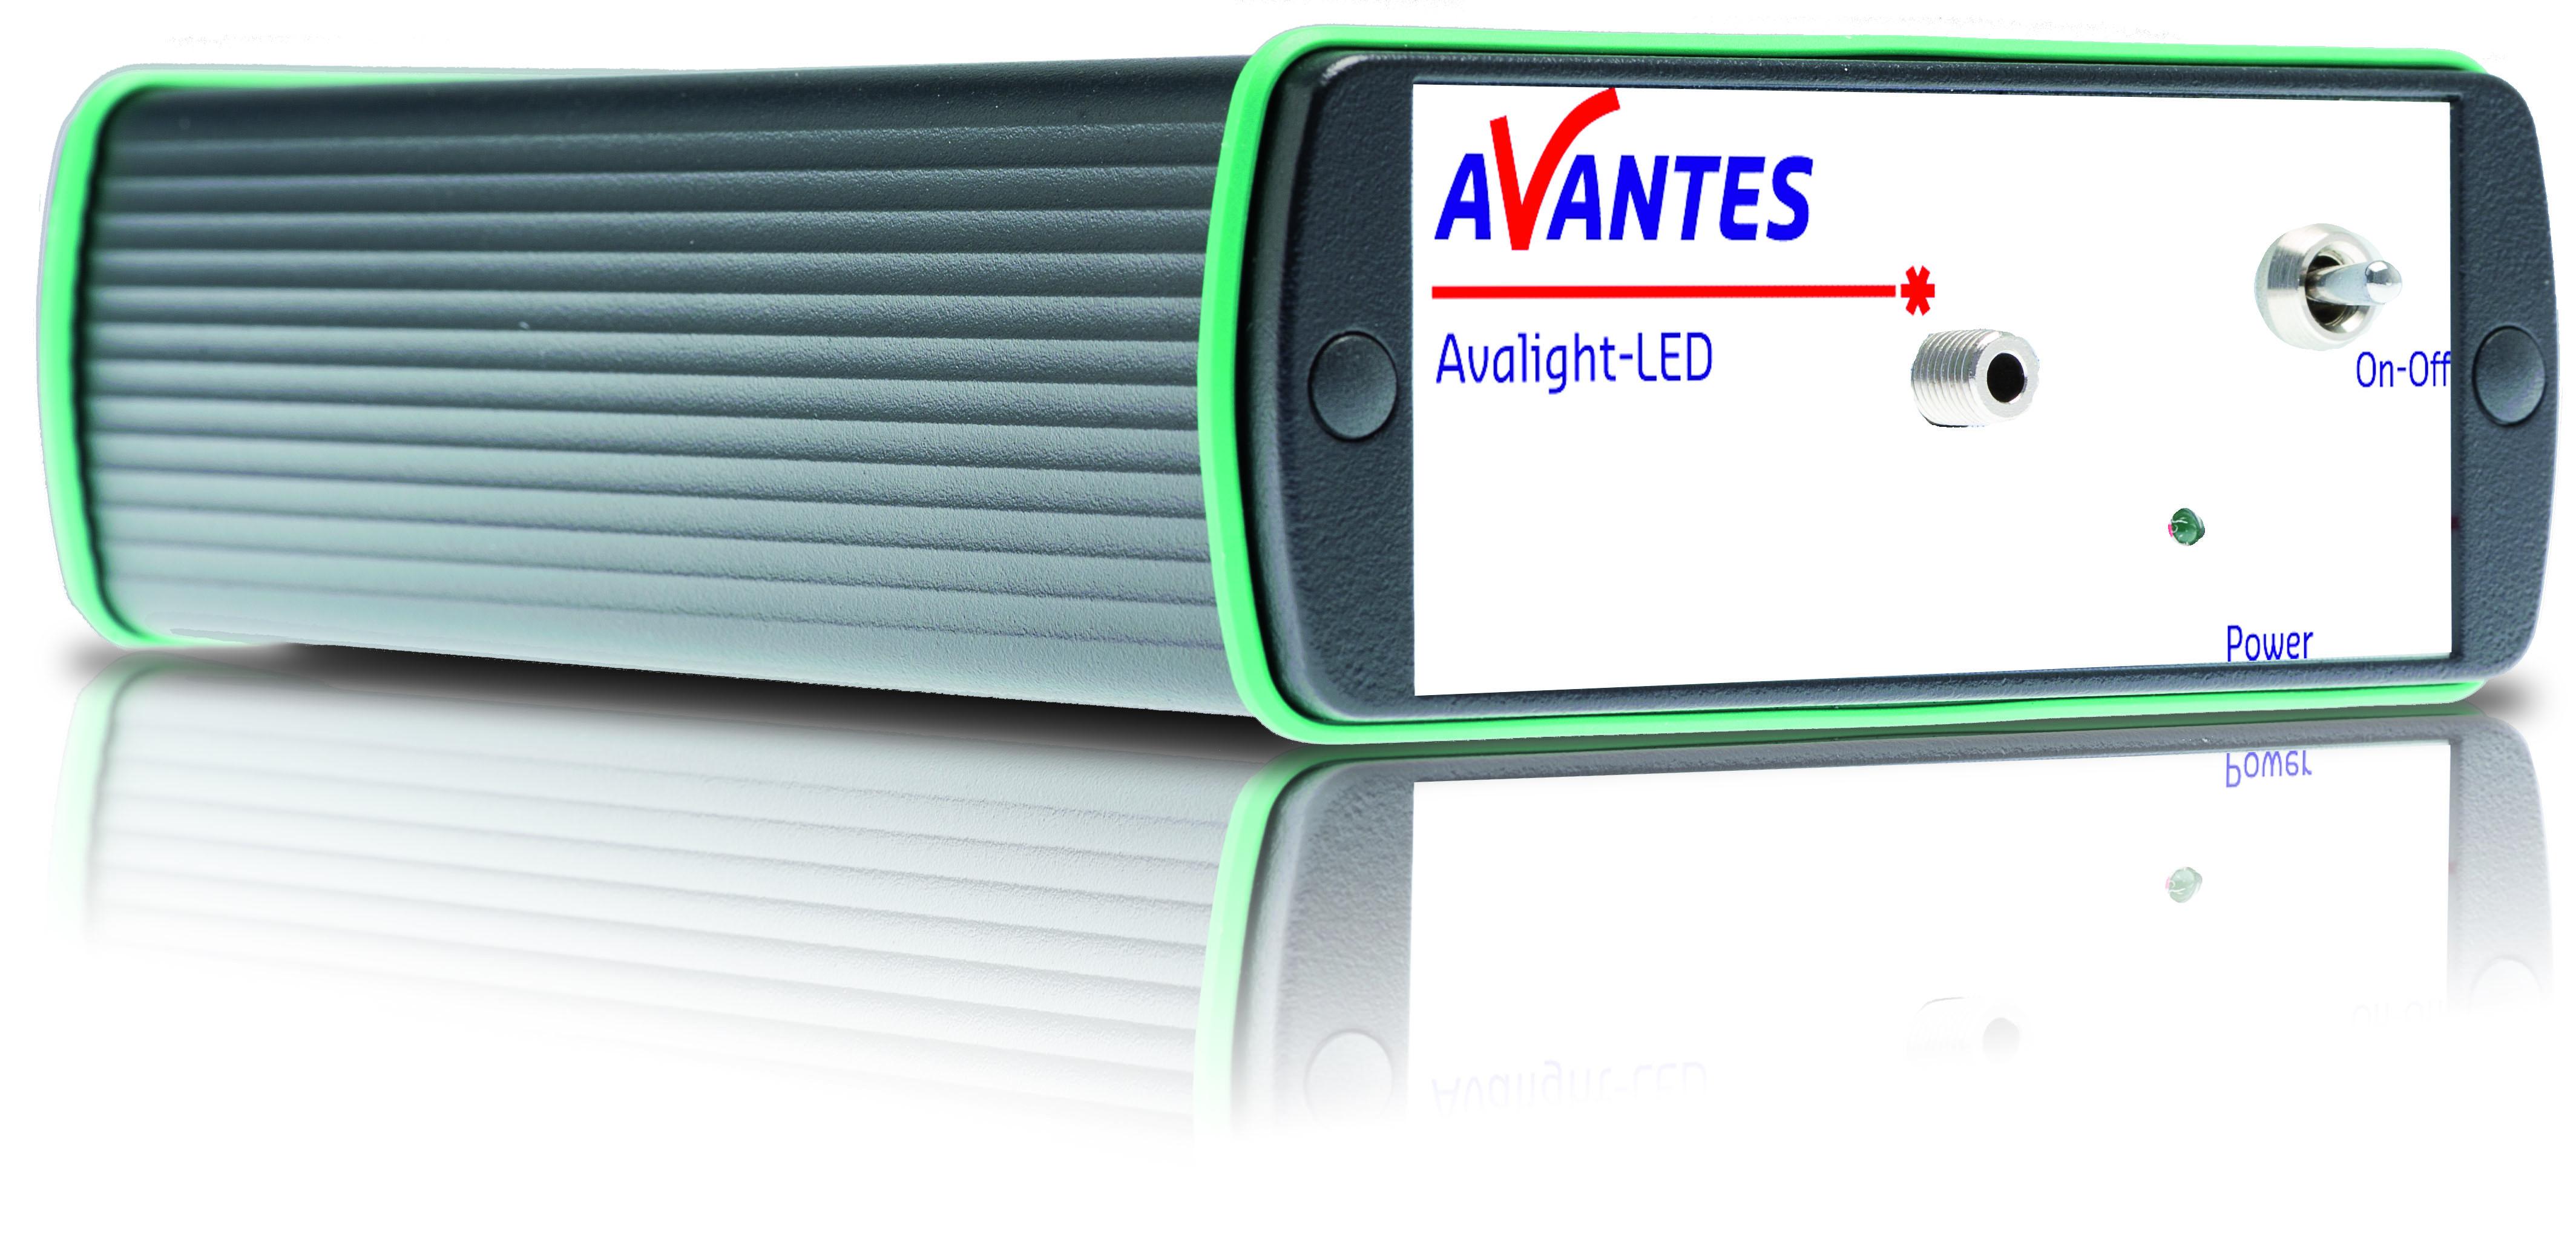 AvaLight-LED 熒光測量用光源